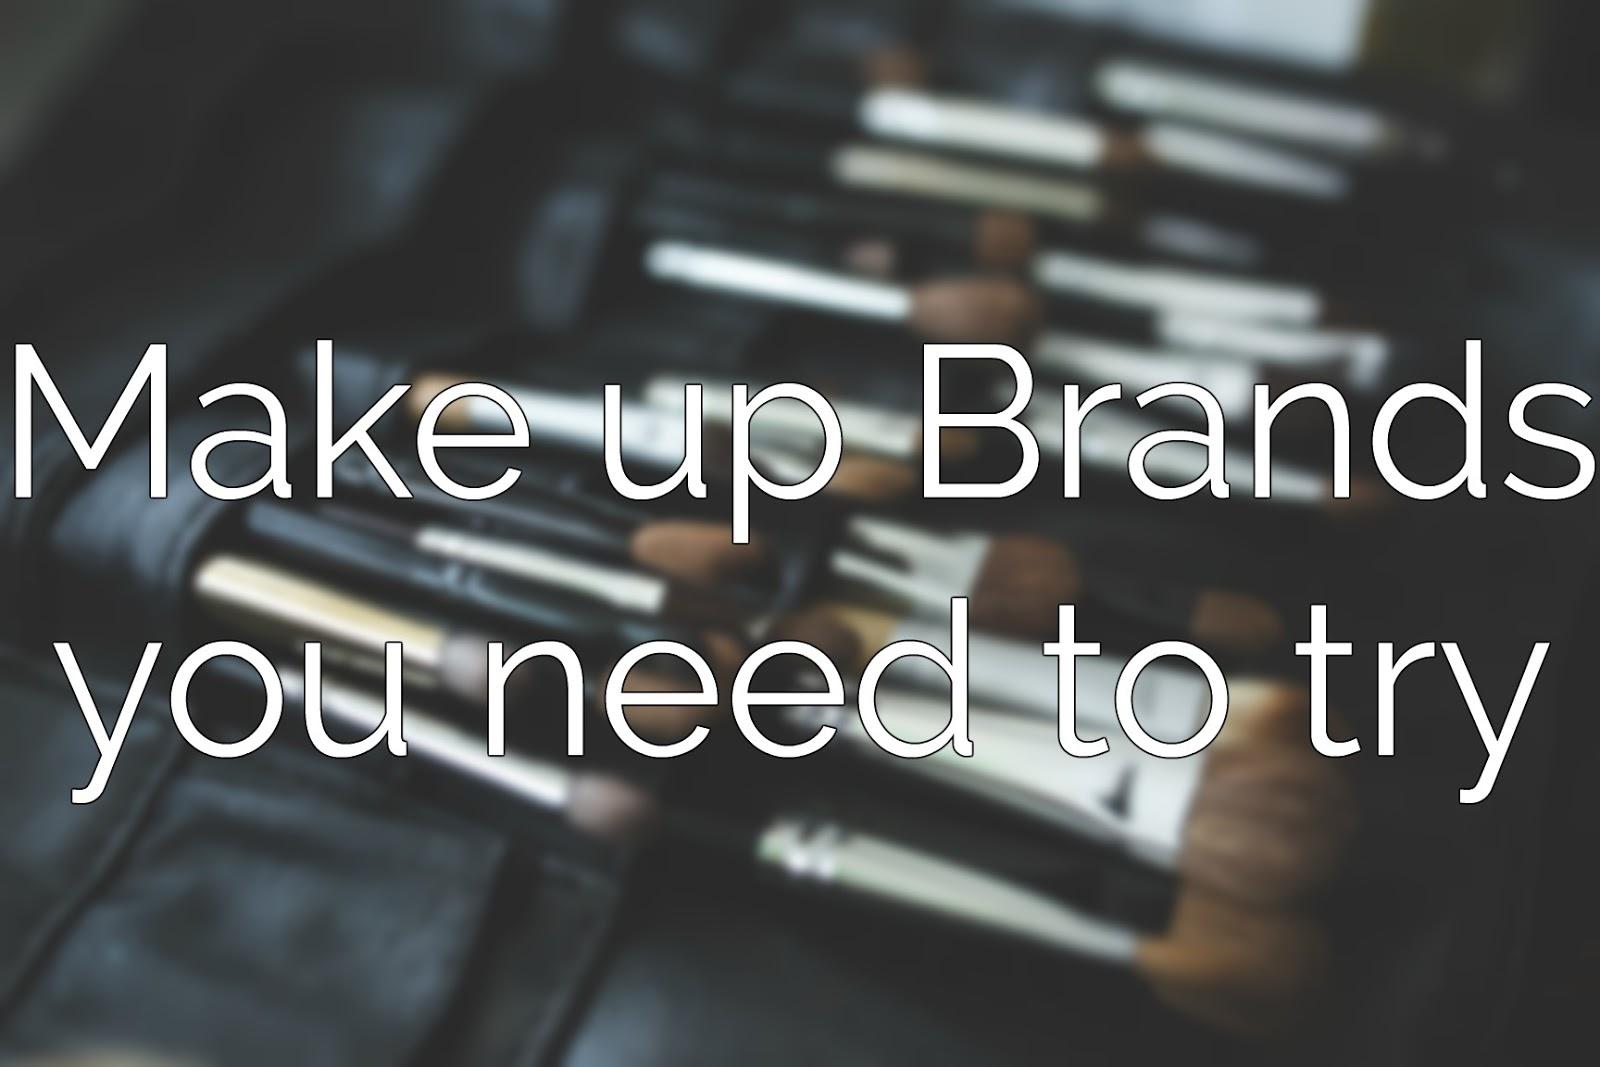 Make up brands - first impressions - make up - beauty - bellapierre - essence - freedom - Jane Iredale - Make up - Wunder2